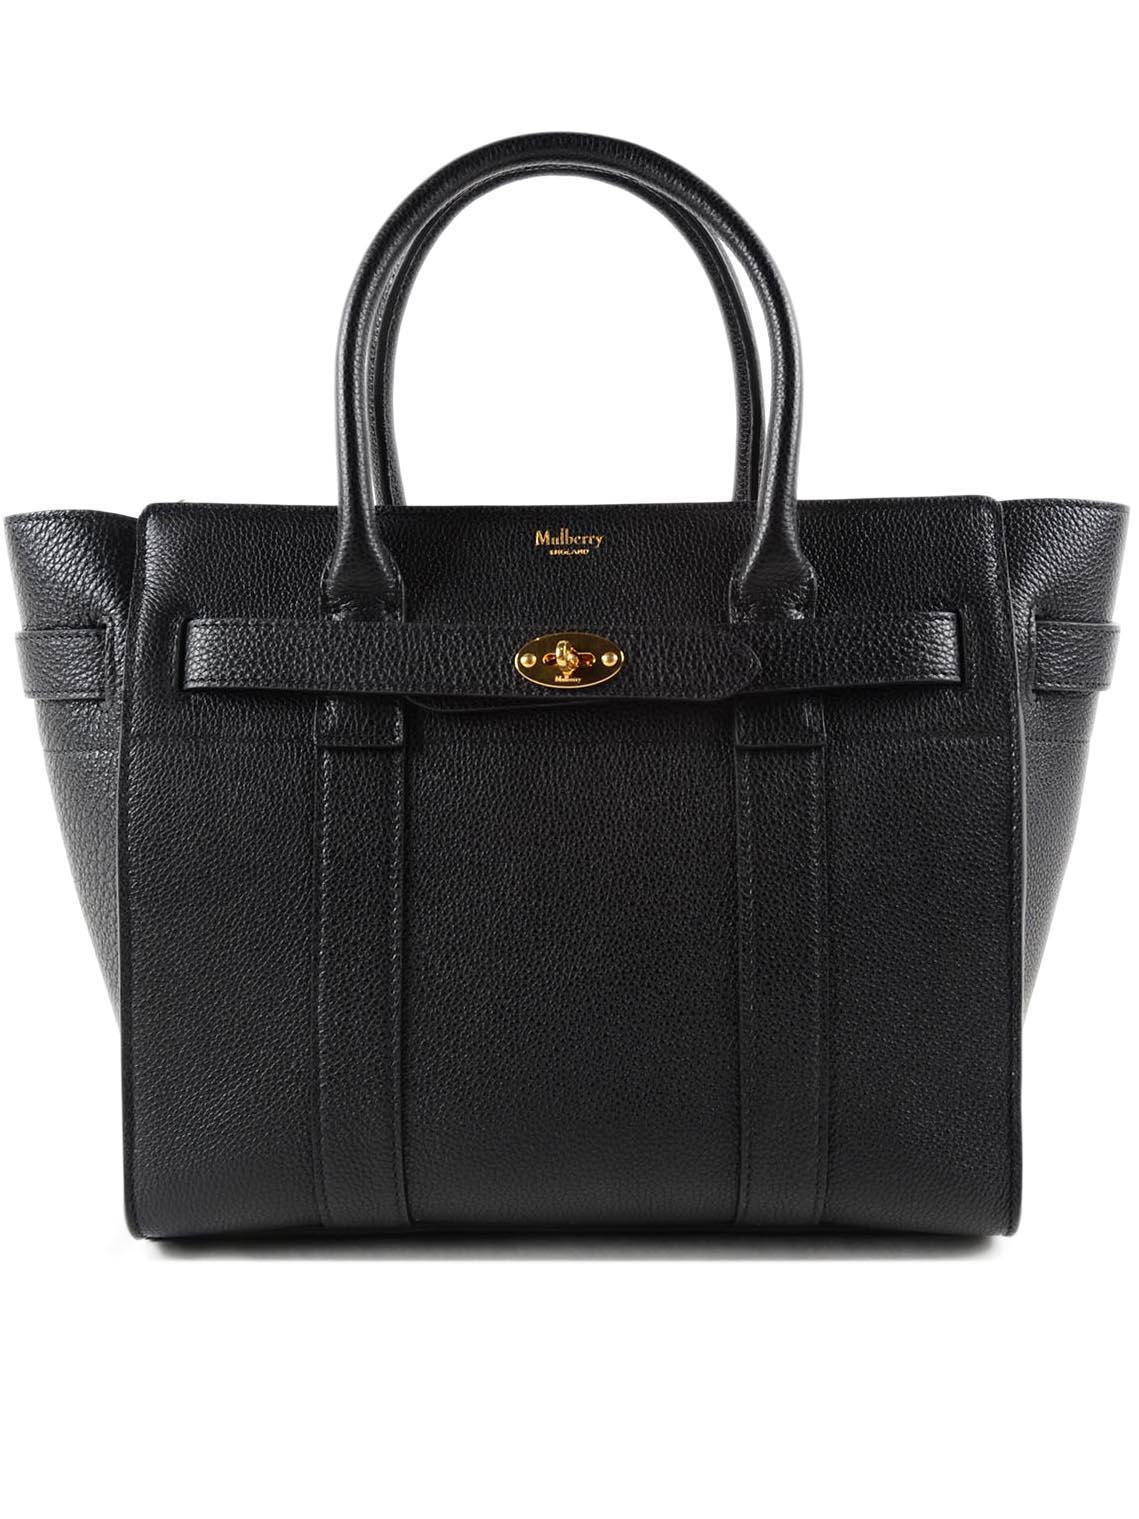 6132d29eeb Mulberry - Black Small Zip Bayswater Bag - Lyst. View fullscreen